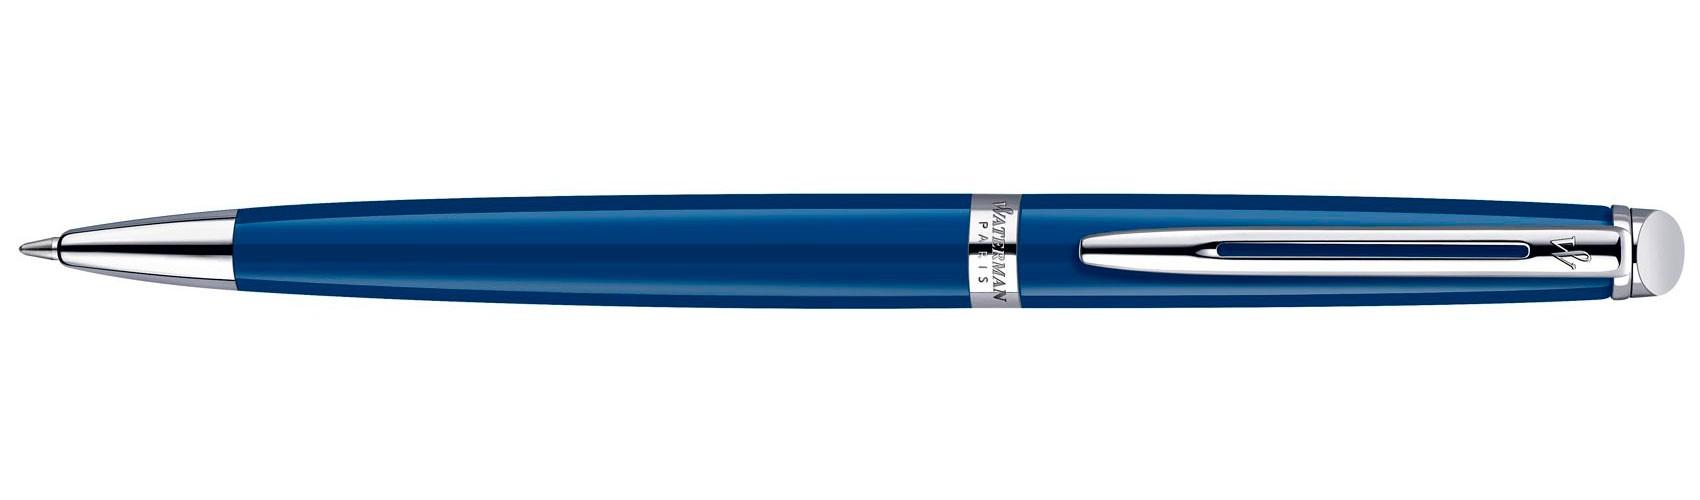 Шариковая ручка Waterman Hemisphere